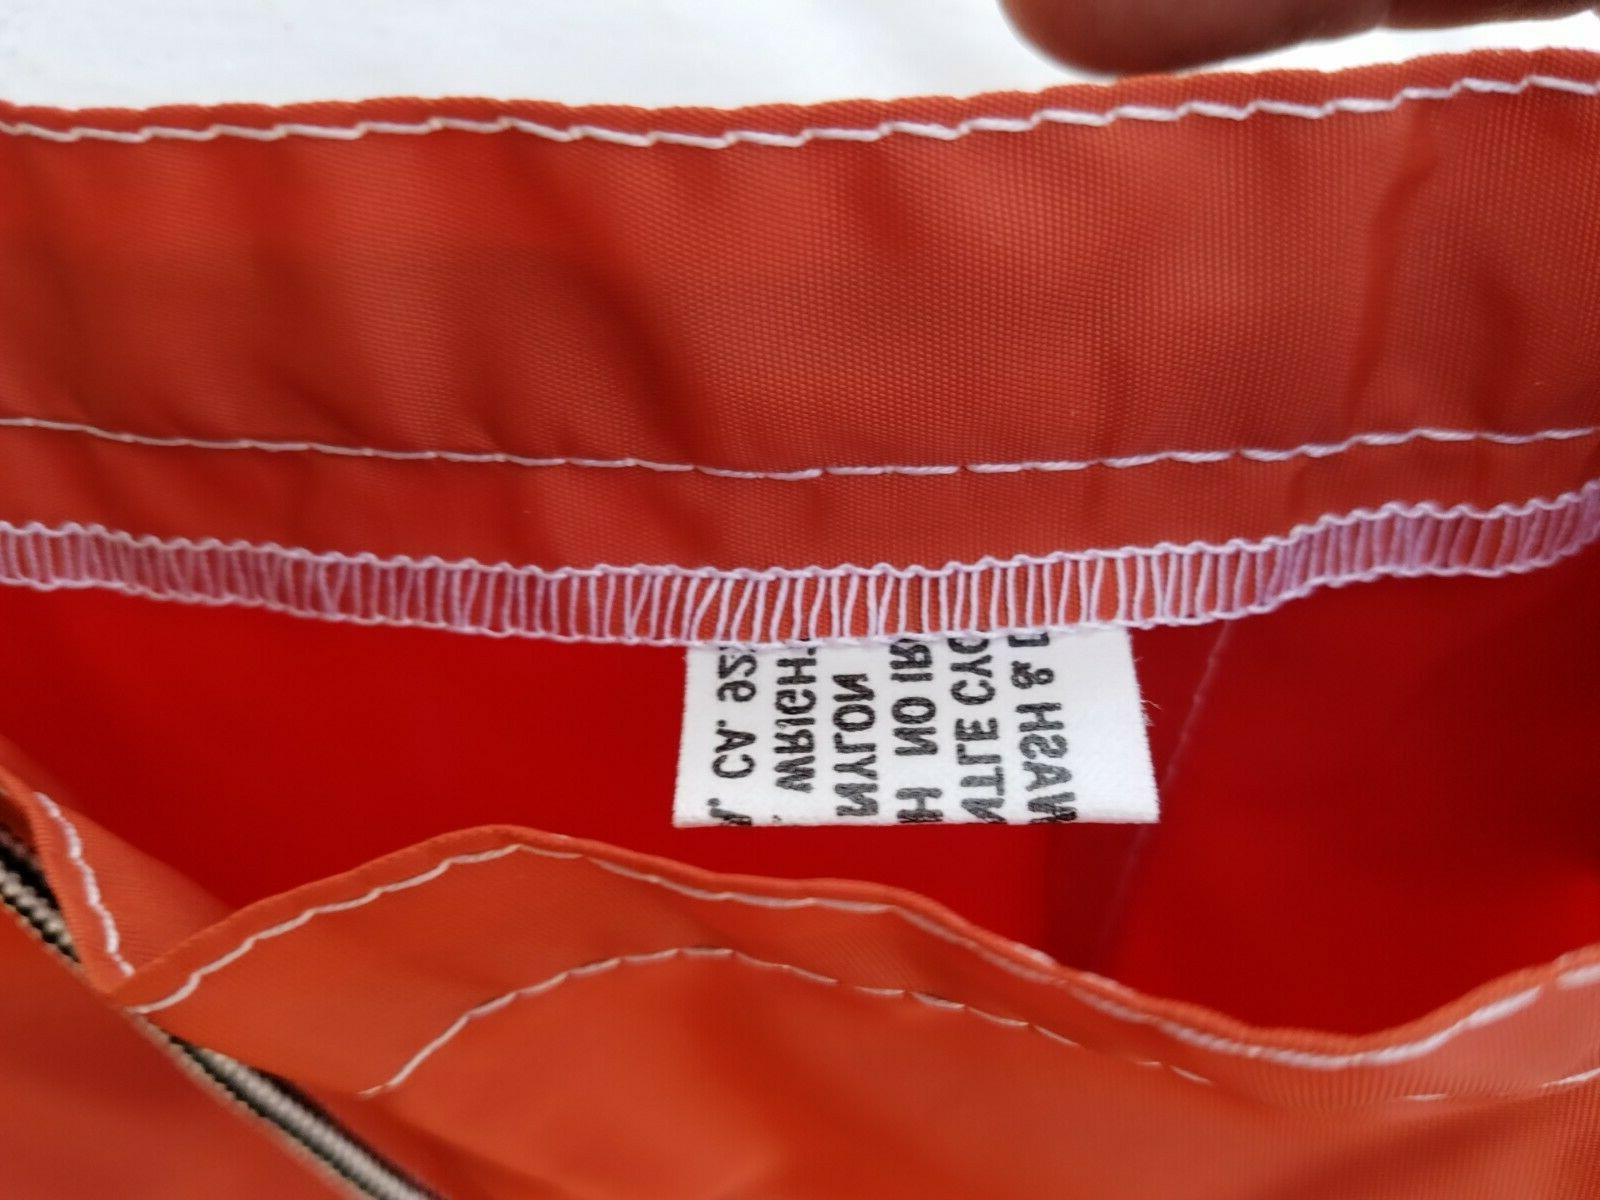 Birdwell Britches Shorts Size Trunks Rustic Orange